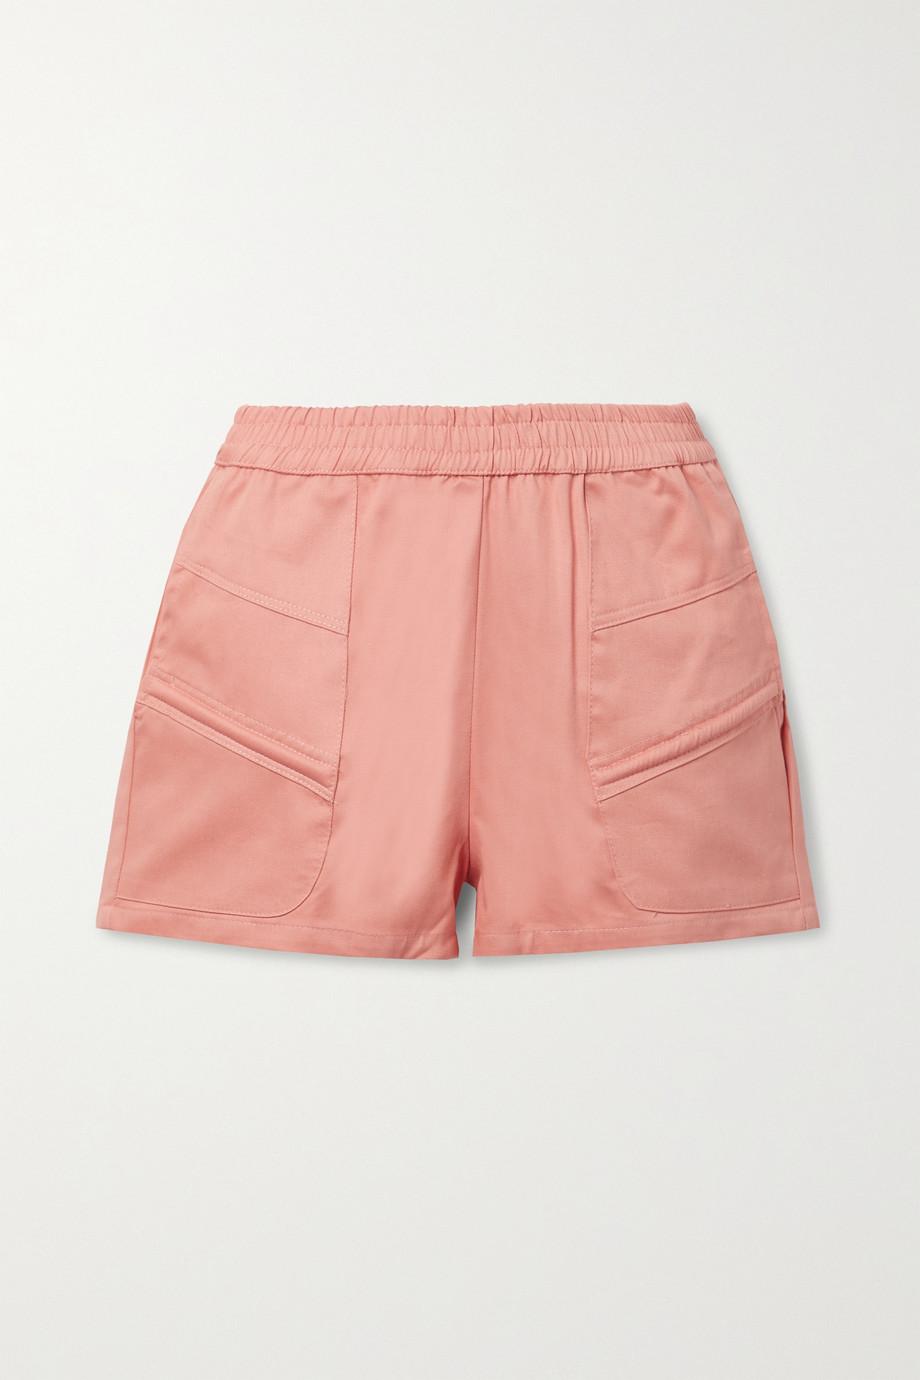 Paradised + NET SUSTAIN Prim cotton-twill shorts